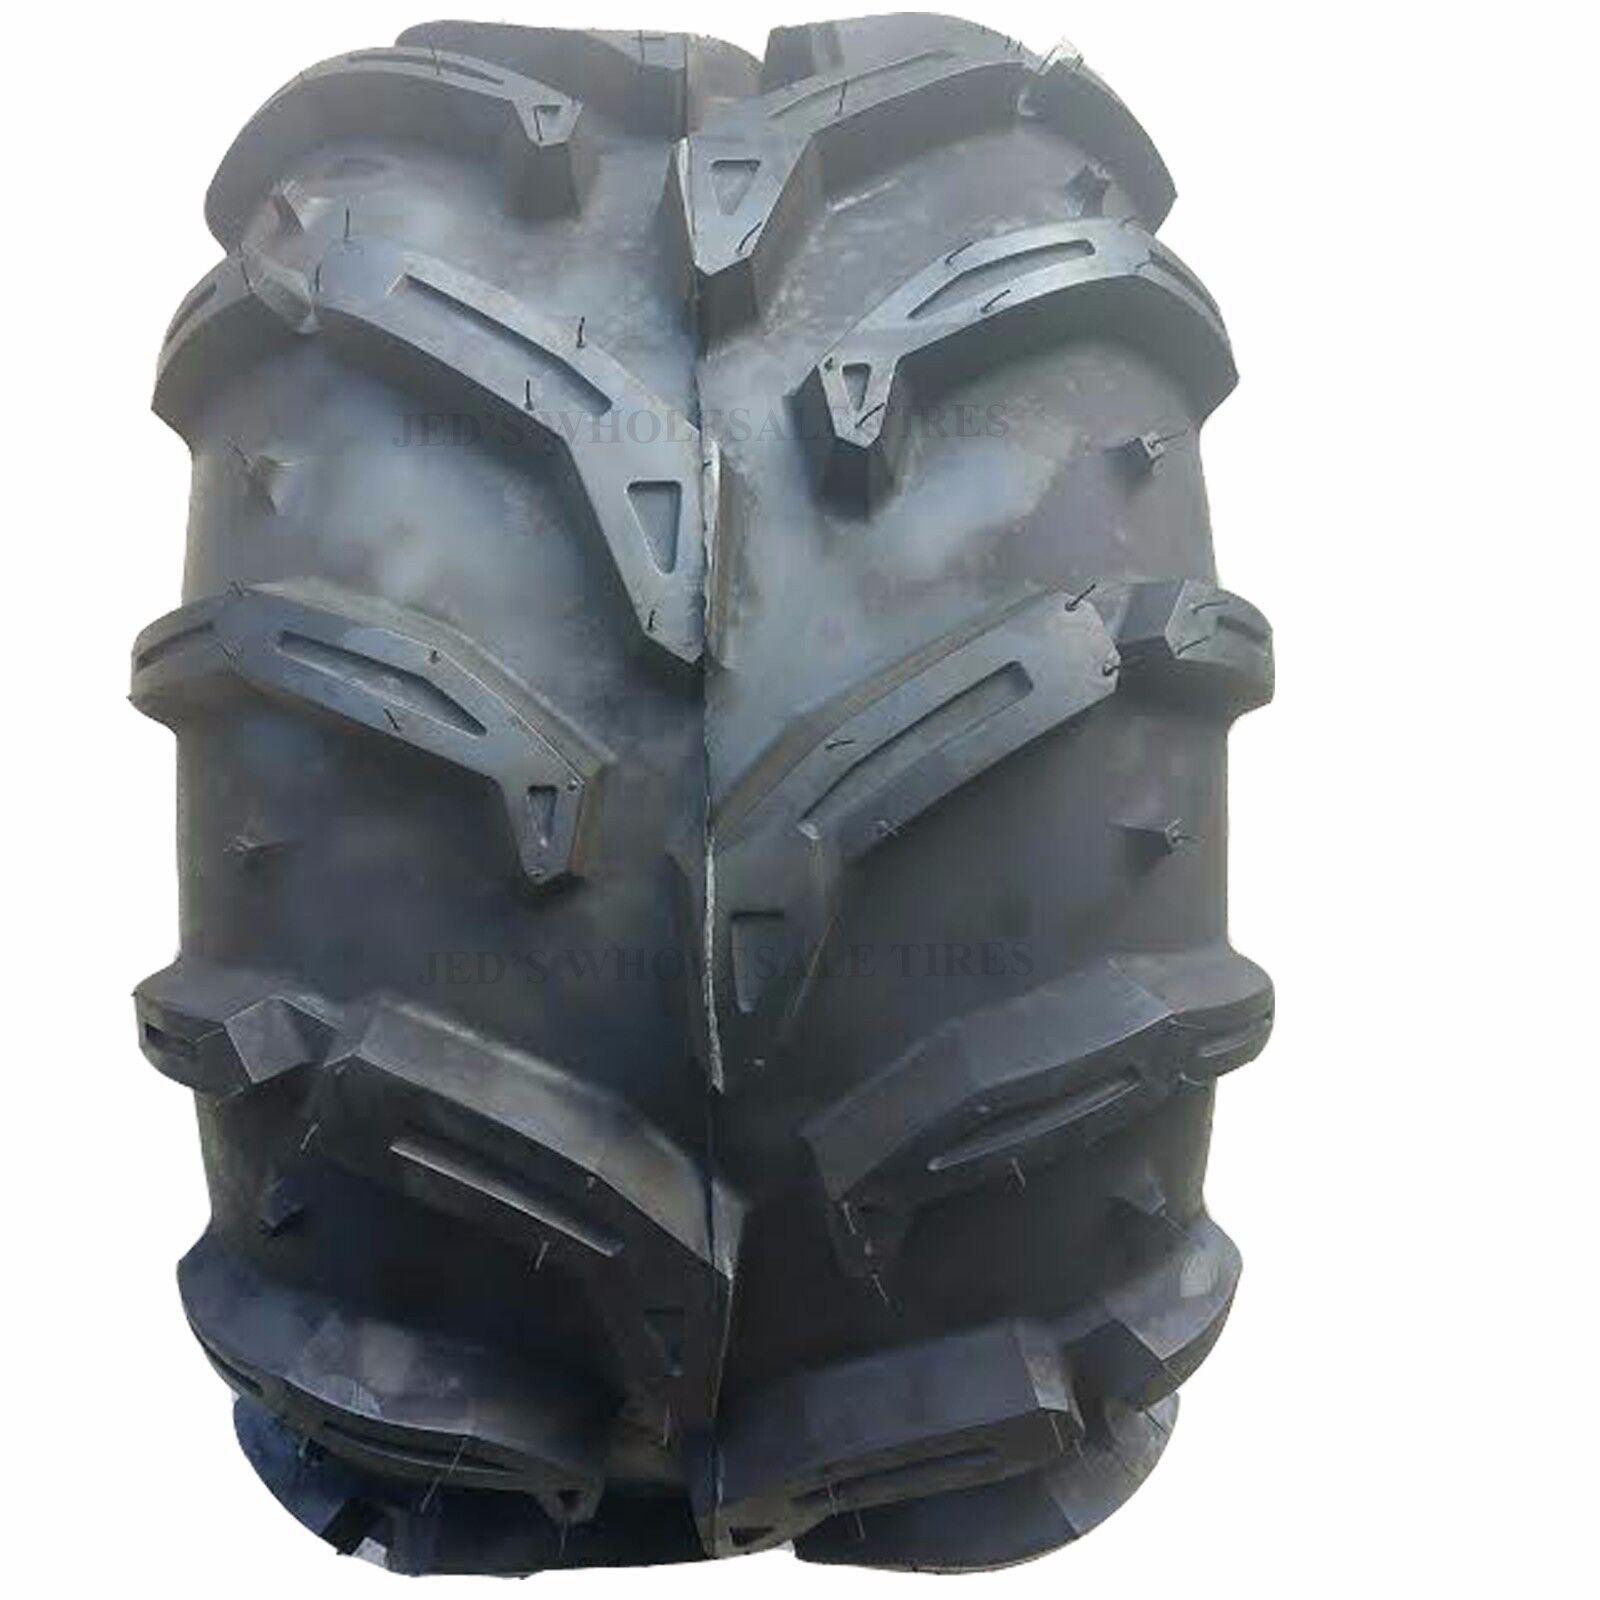 10AN 400 Series TWIST LOK BLACK HOSE Push Lock Hose 10 An Fuel Oil